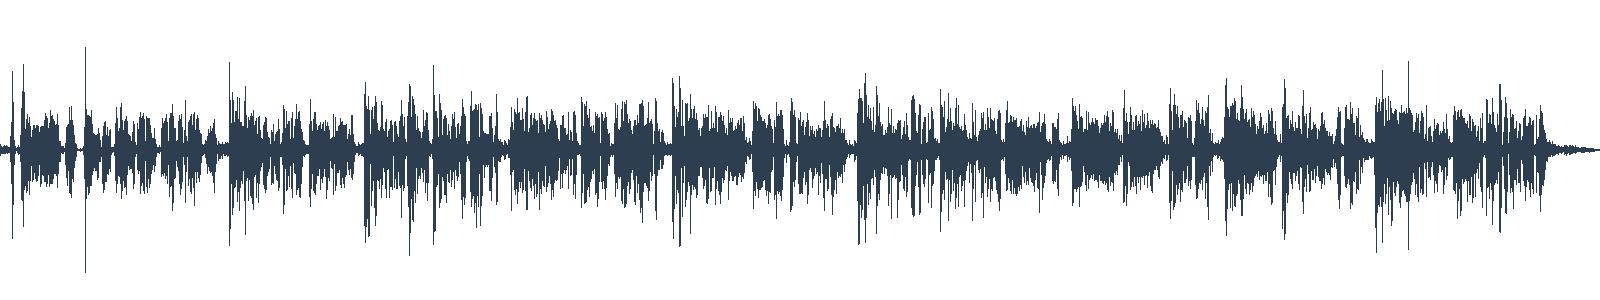 Nové audioknihy 8/2019 waveform